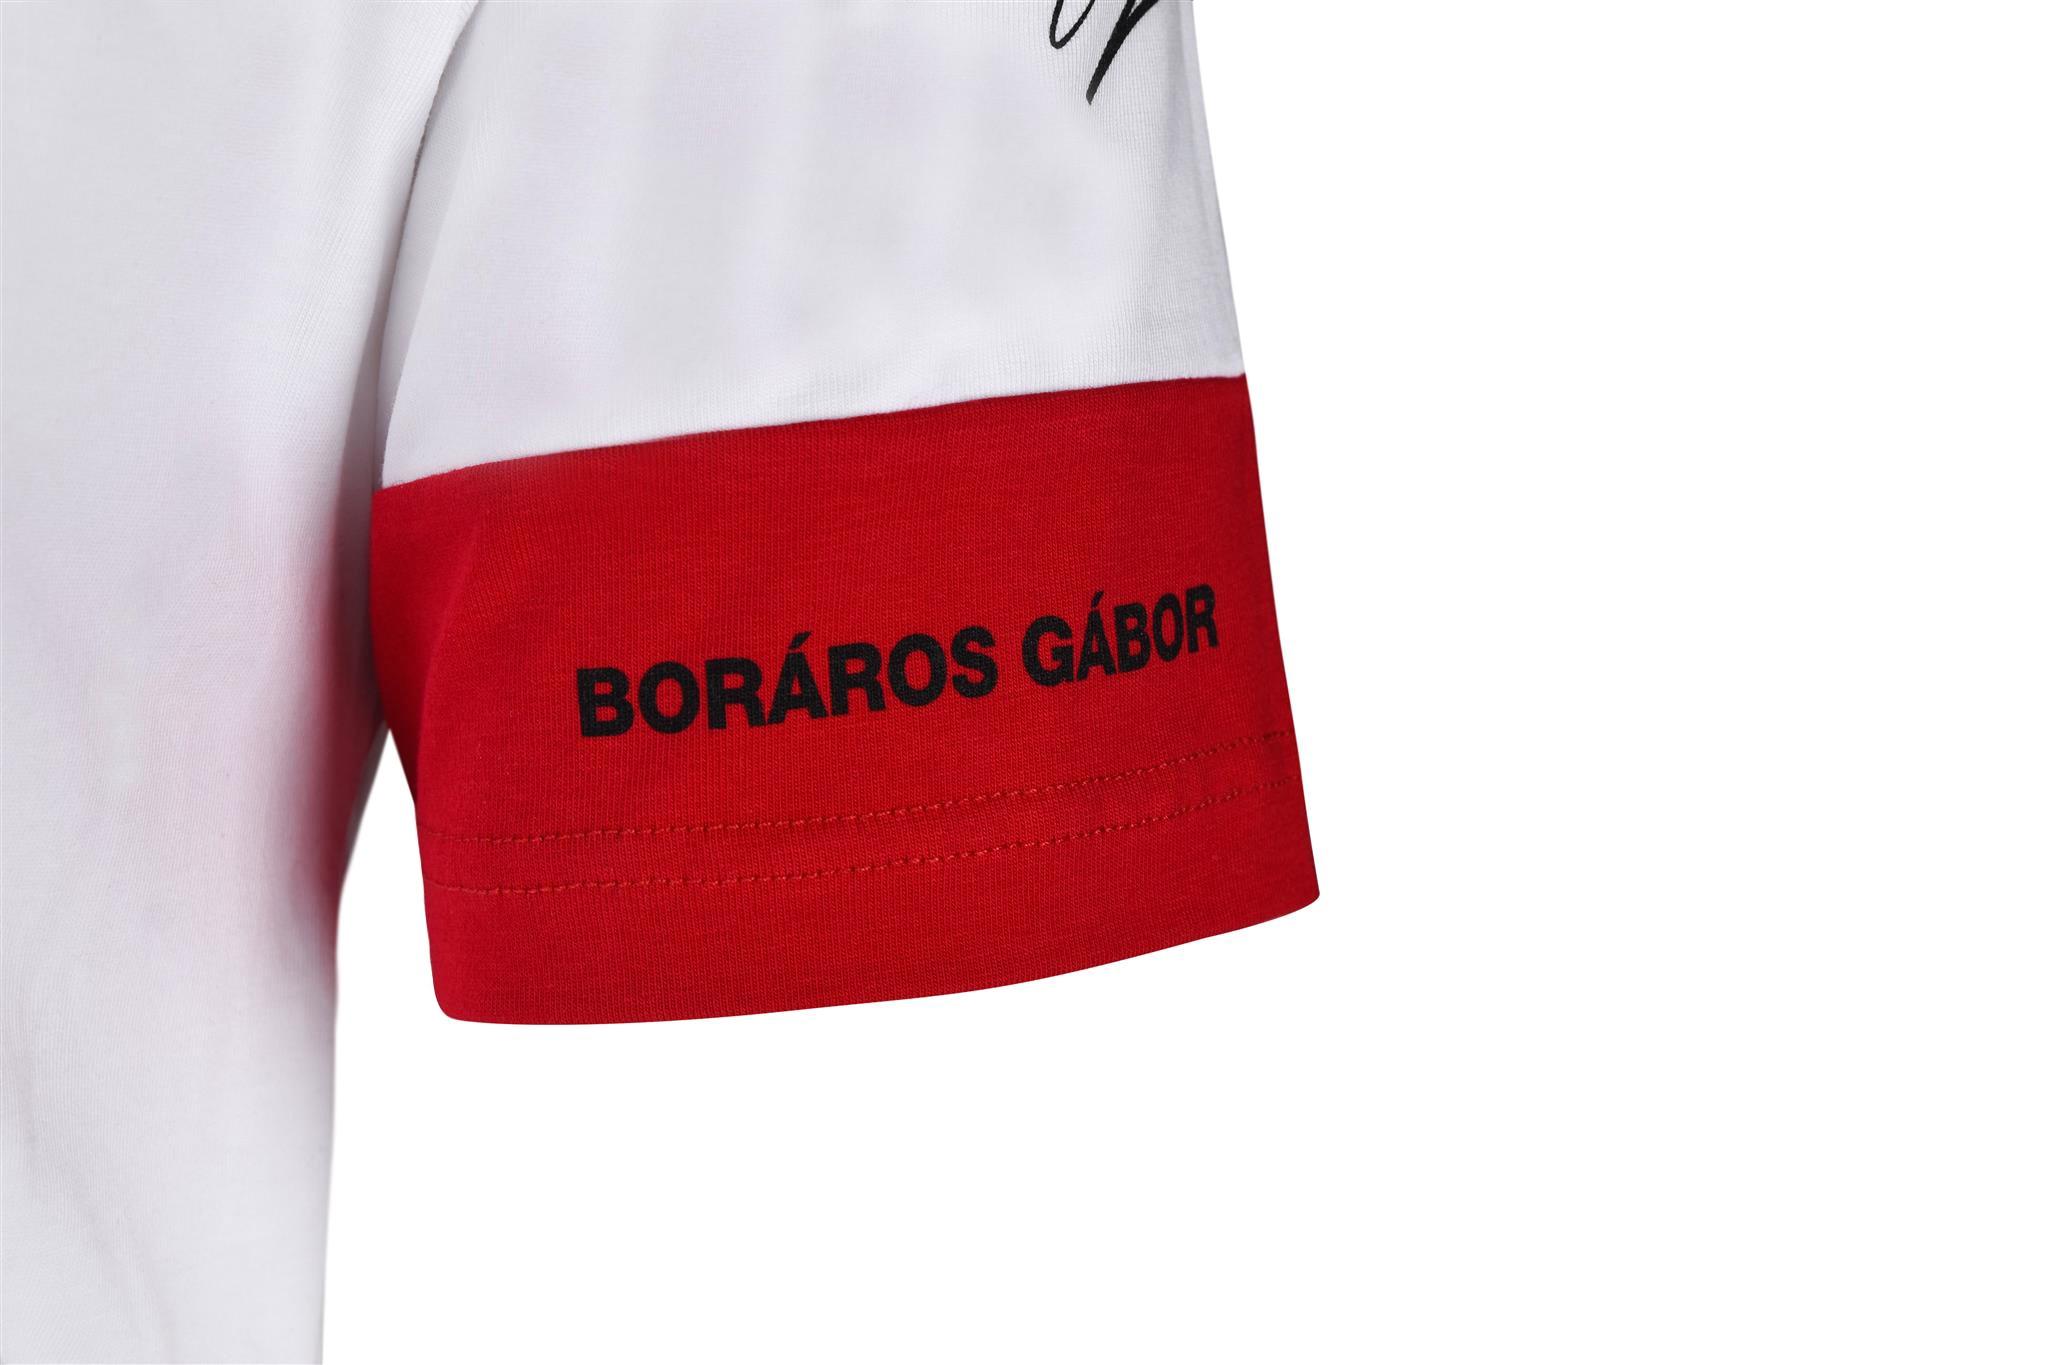 ZZZUŤŤ Boráros Gábor